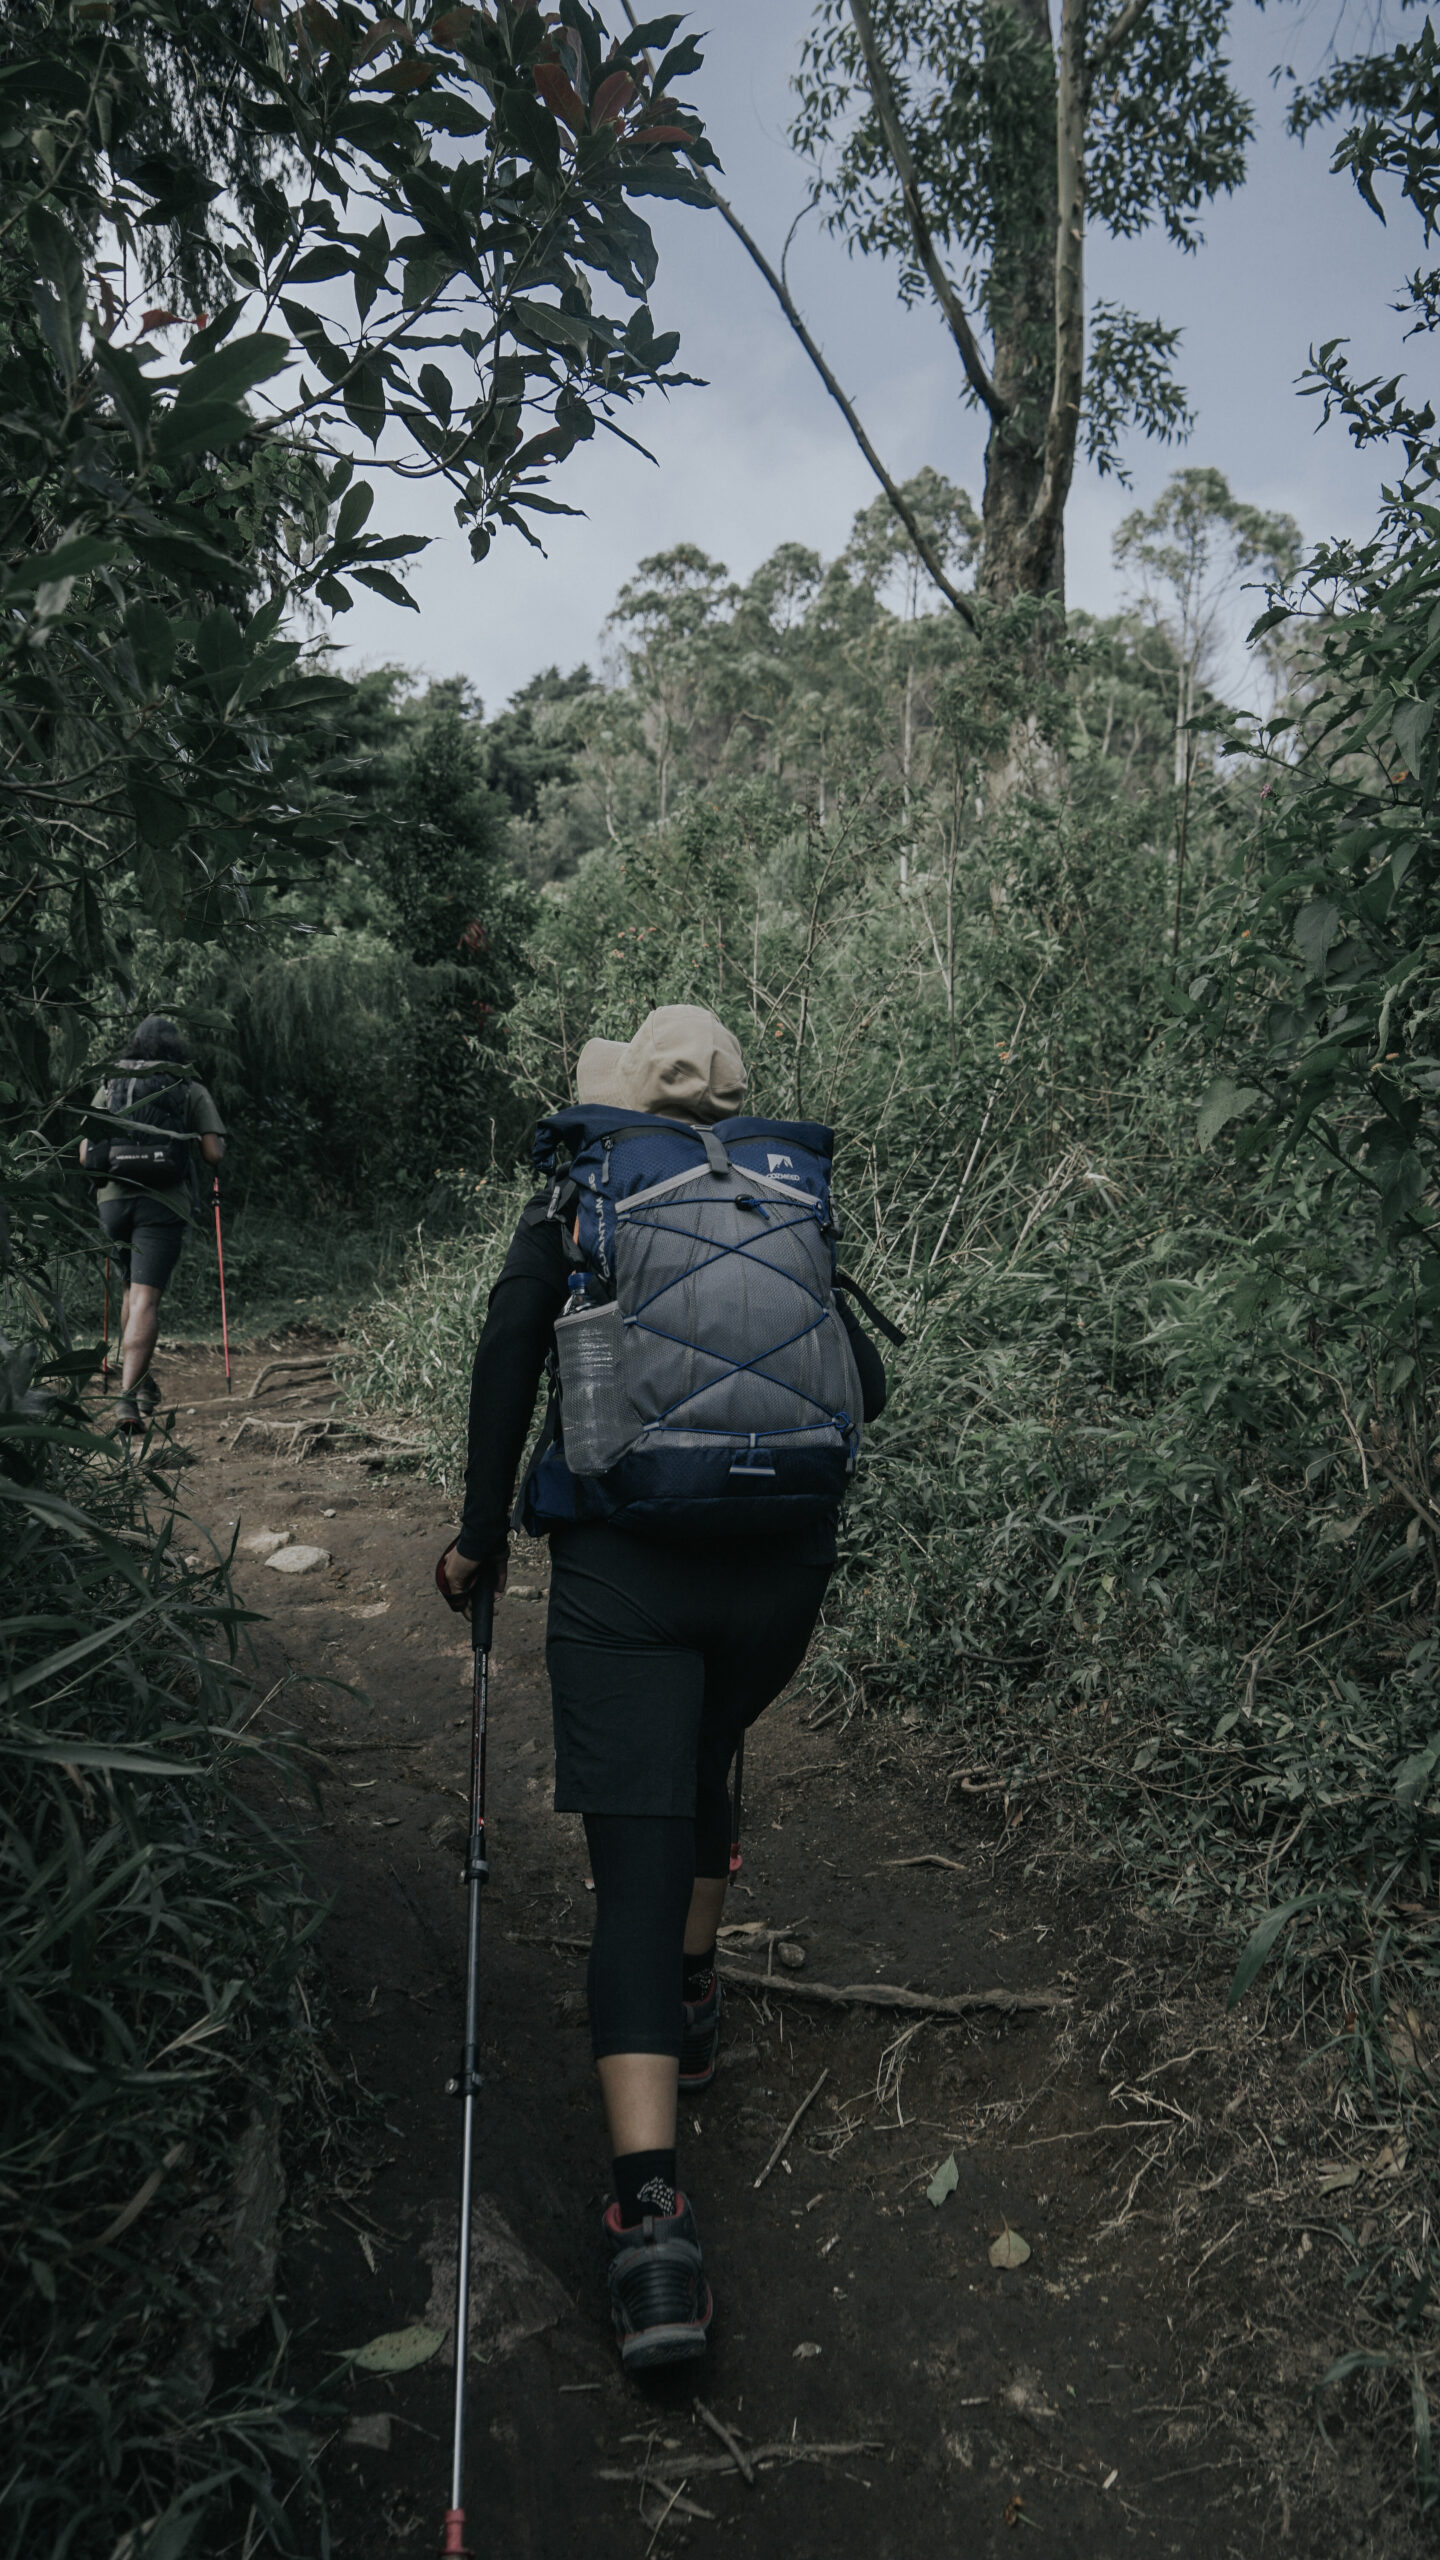 Gambar Definisi Ultralight Hiking dan Macam-macam Peralatan Ultralight 8